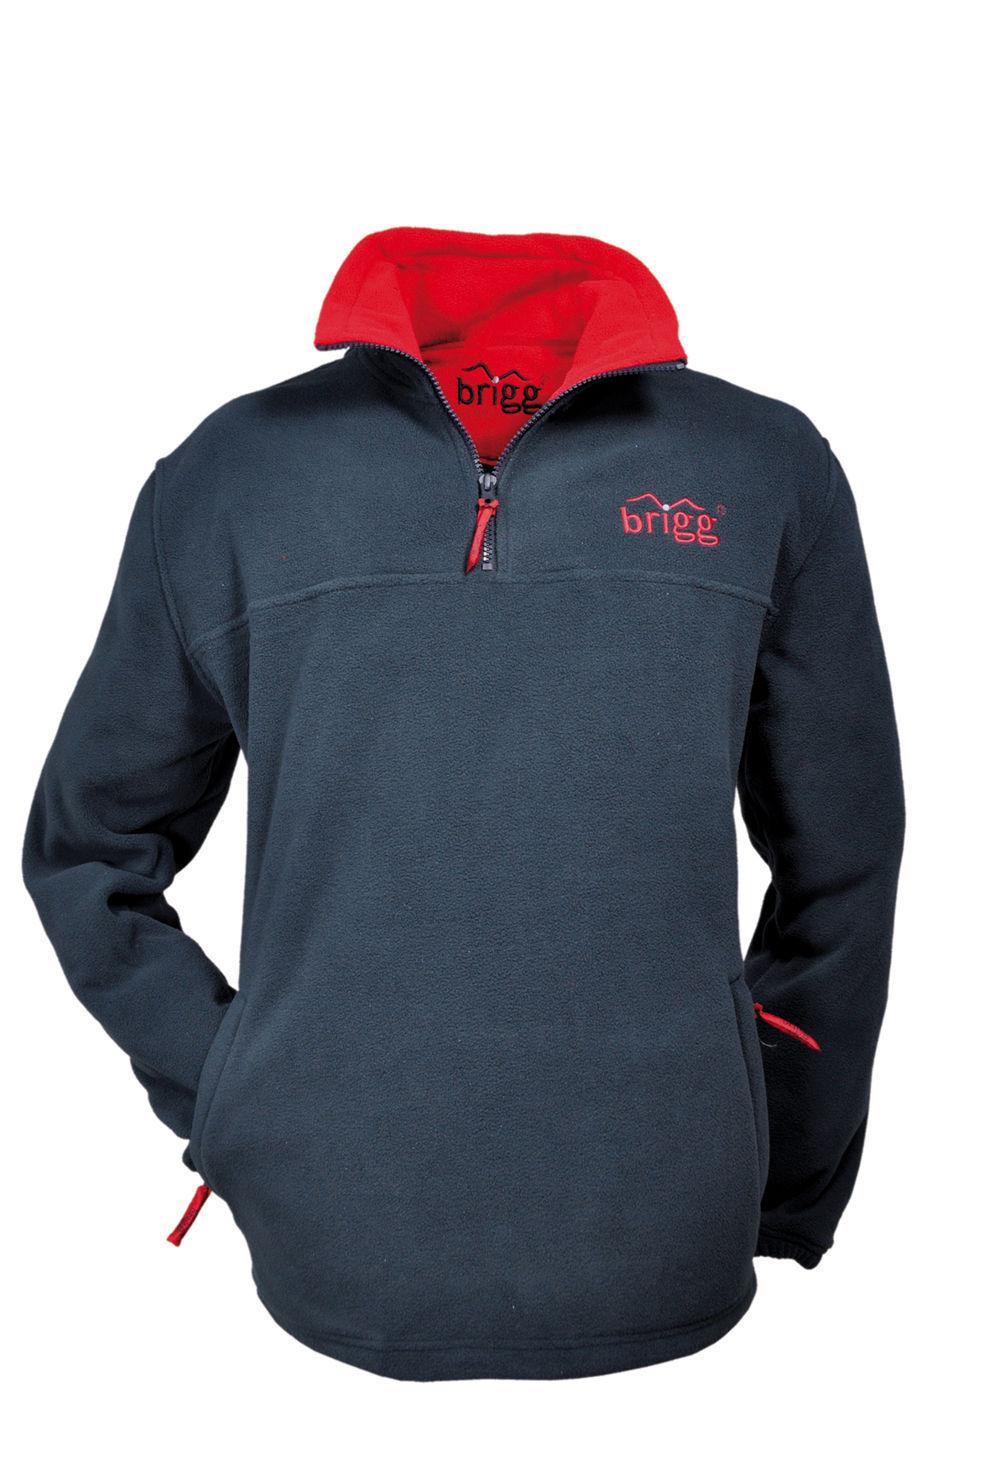 Warmes Fleece SWEATSHIRT Brigg anti-pilling Unisex blue red